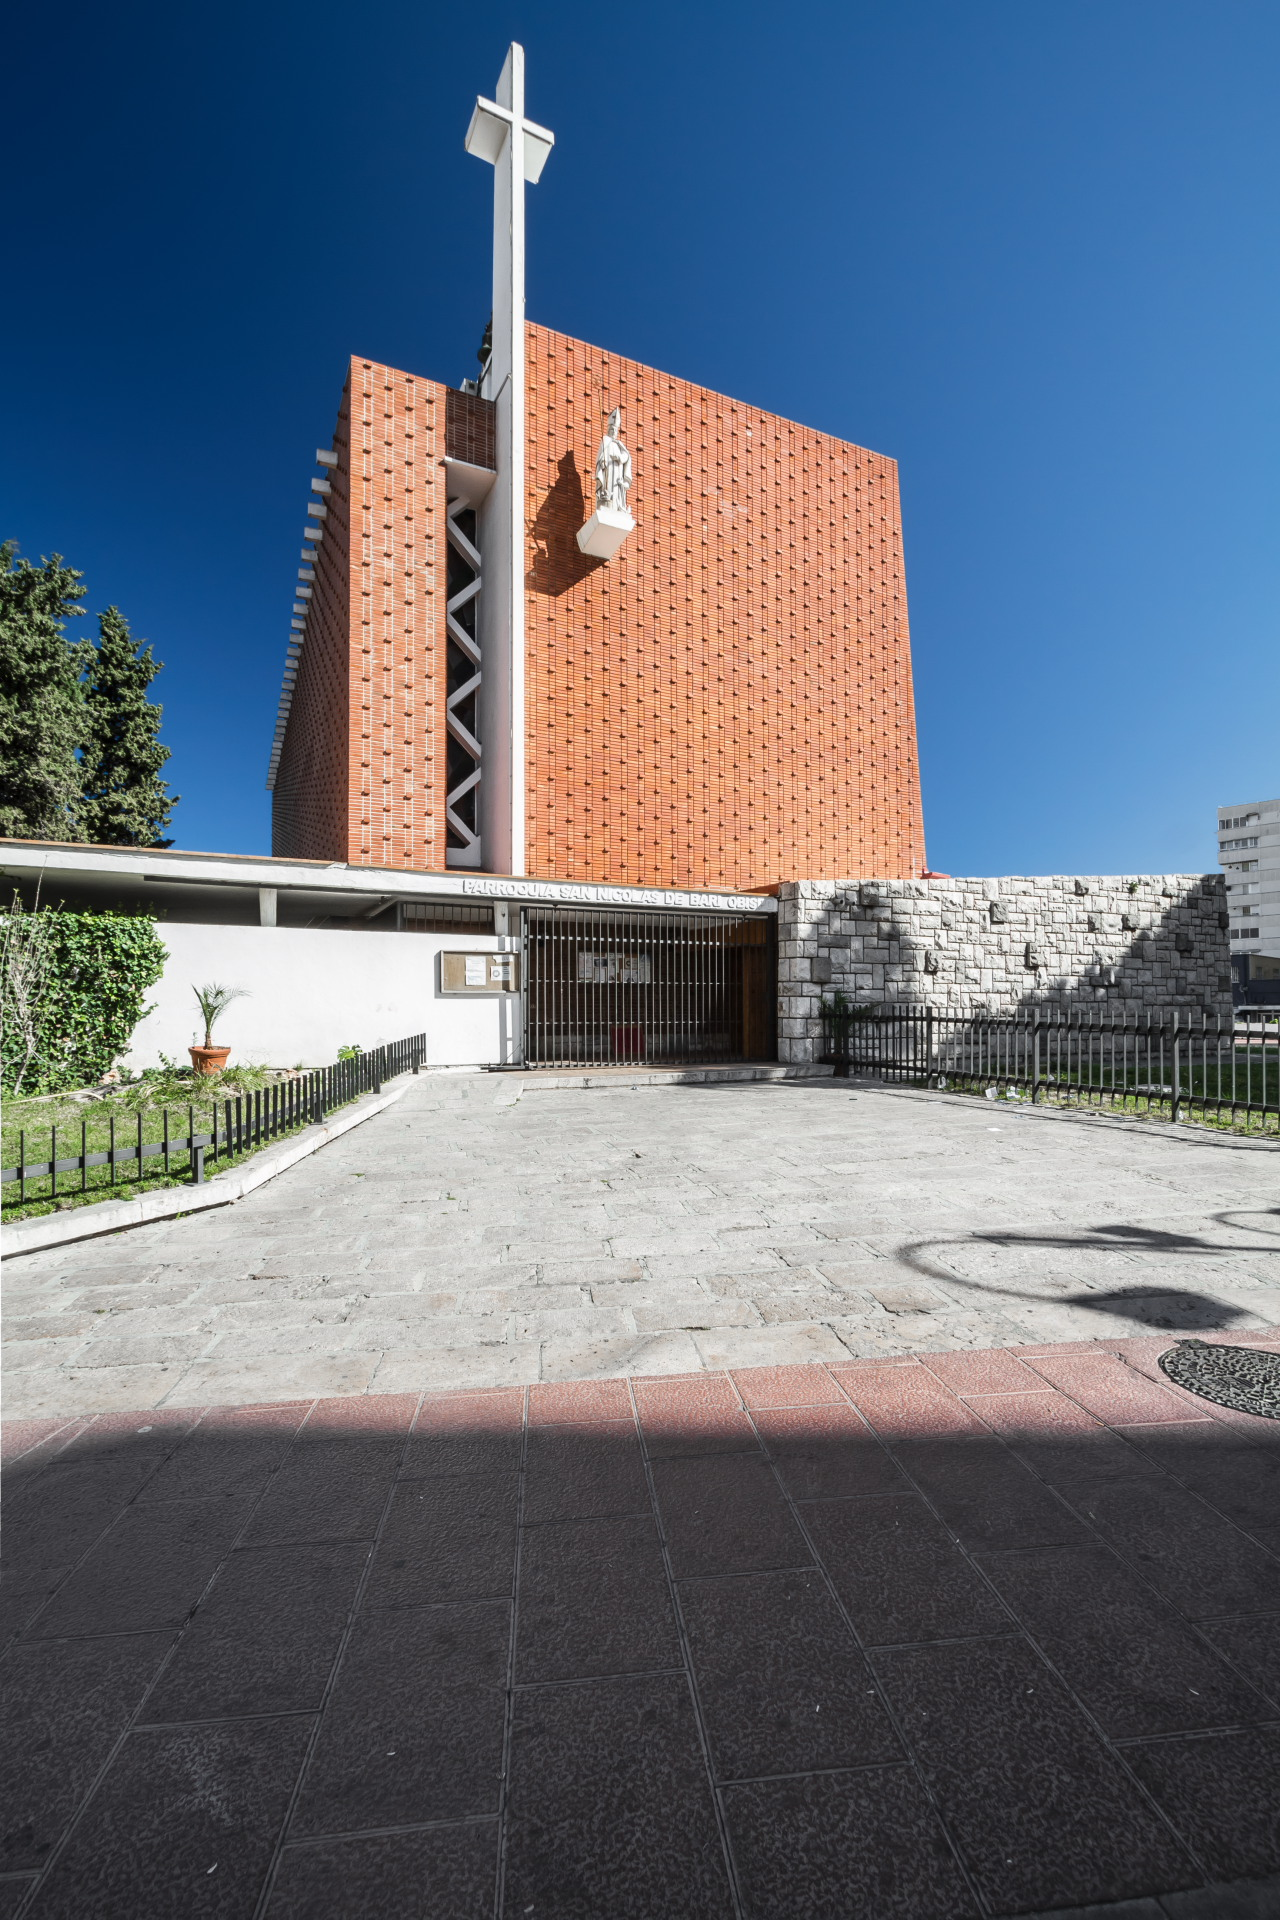 fotografia-arquitectura-valencia-gandia-german-cabo-iglesia-san-nicolas-torroja (6)